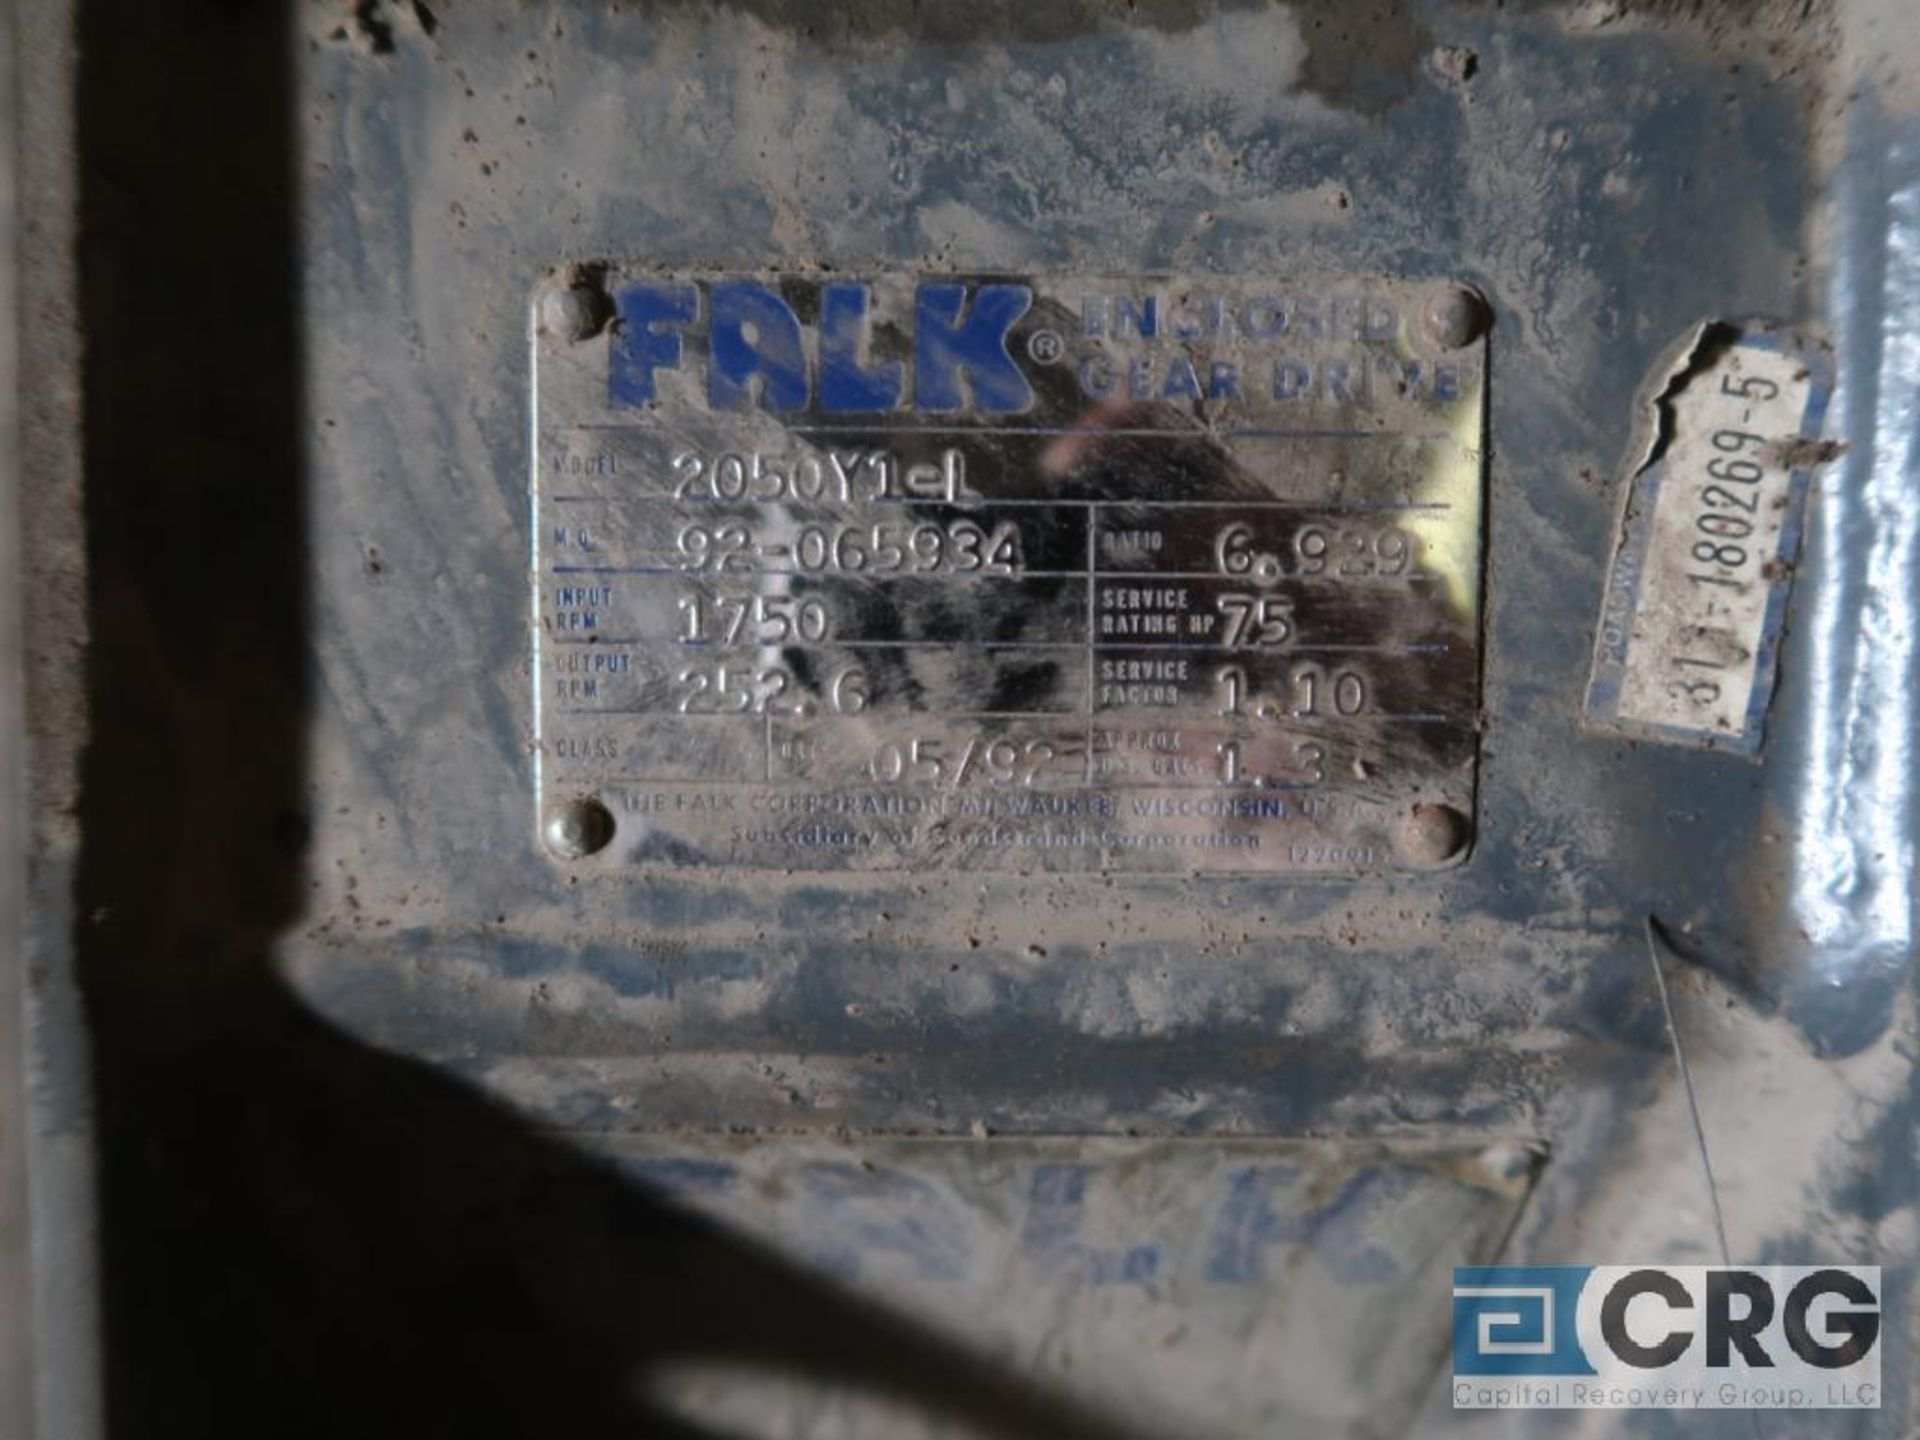 Falk 2050Y1L gear box, ratio- 6.928, input RPM 1,750, output RPM 252.6, service rate HP. 75 (Next - Image 3 of 3